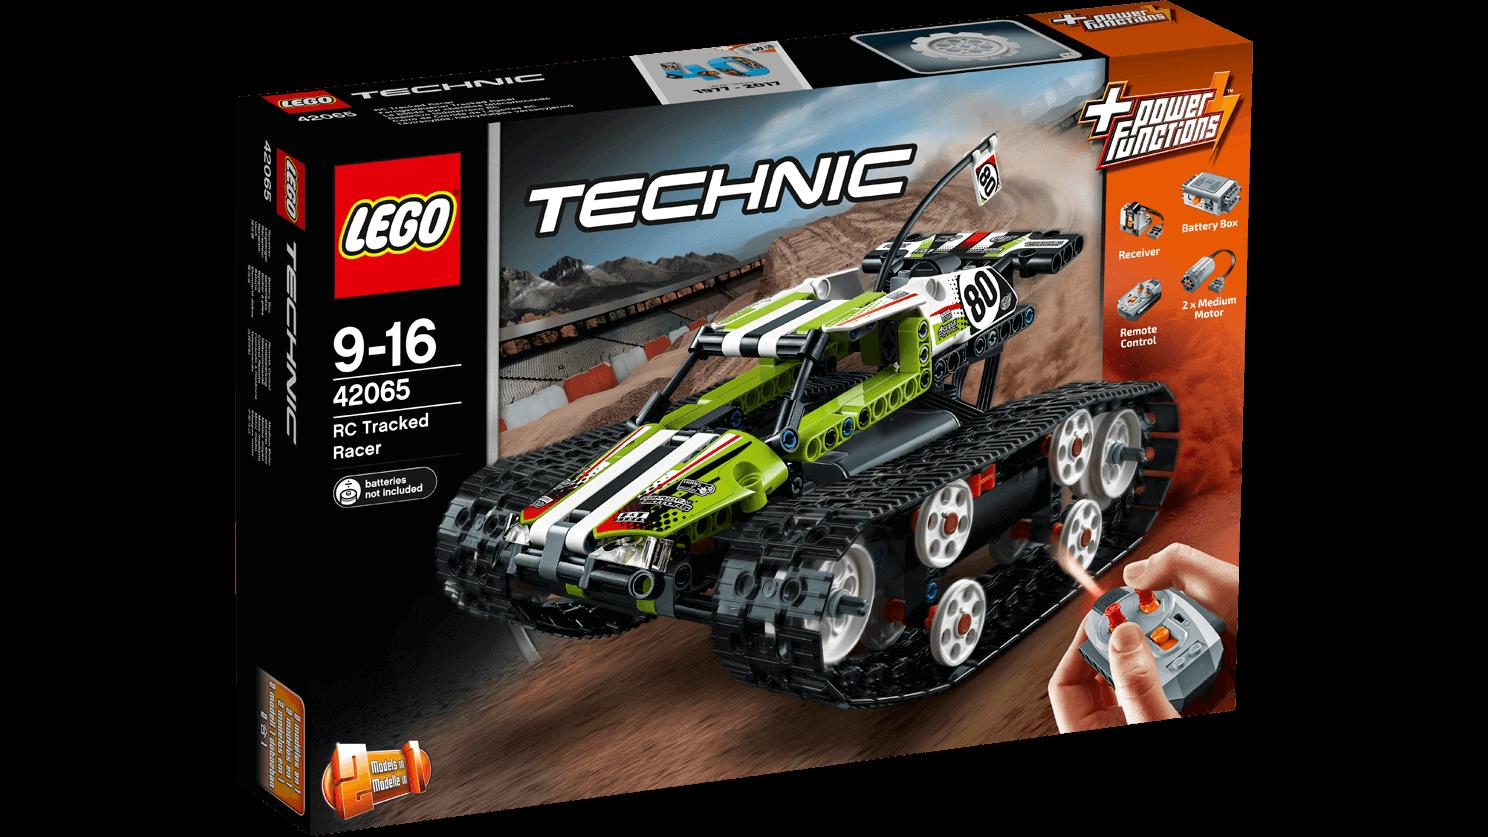 Läs mer om LEGO Technic 42065 RC Tracked Racer